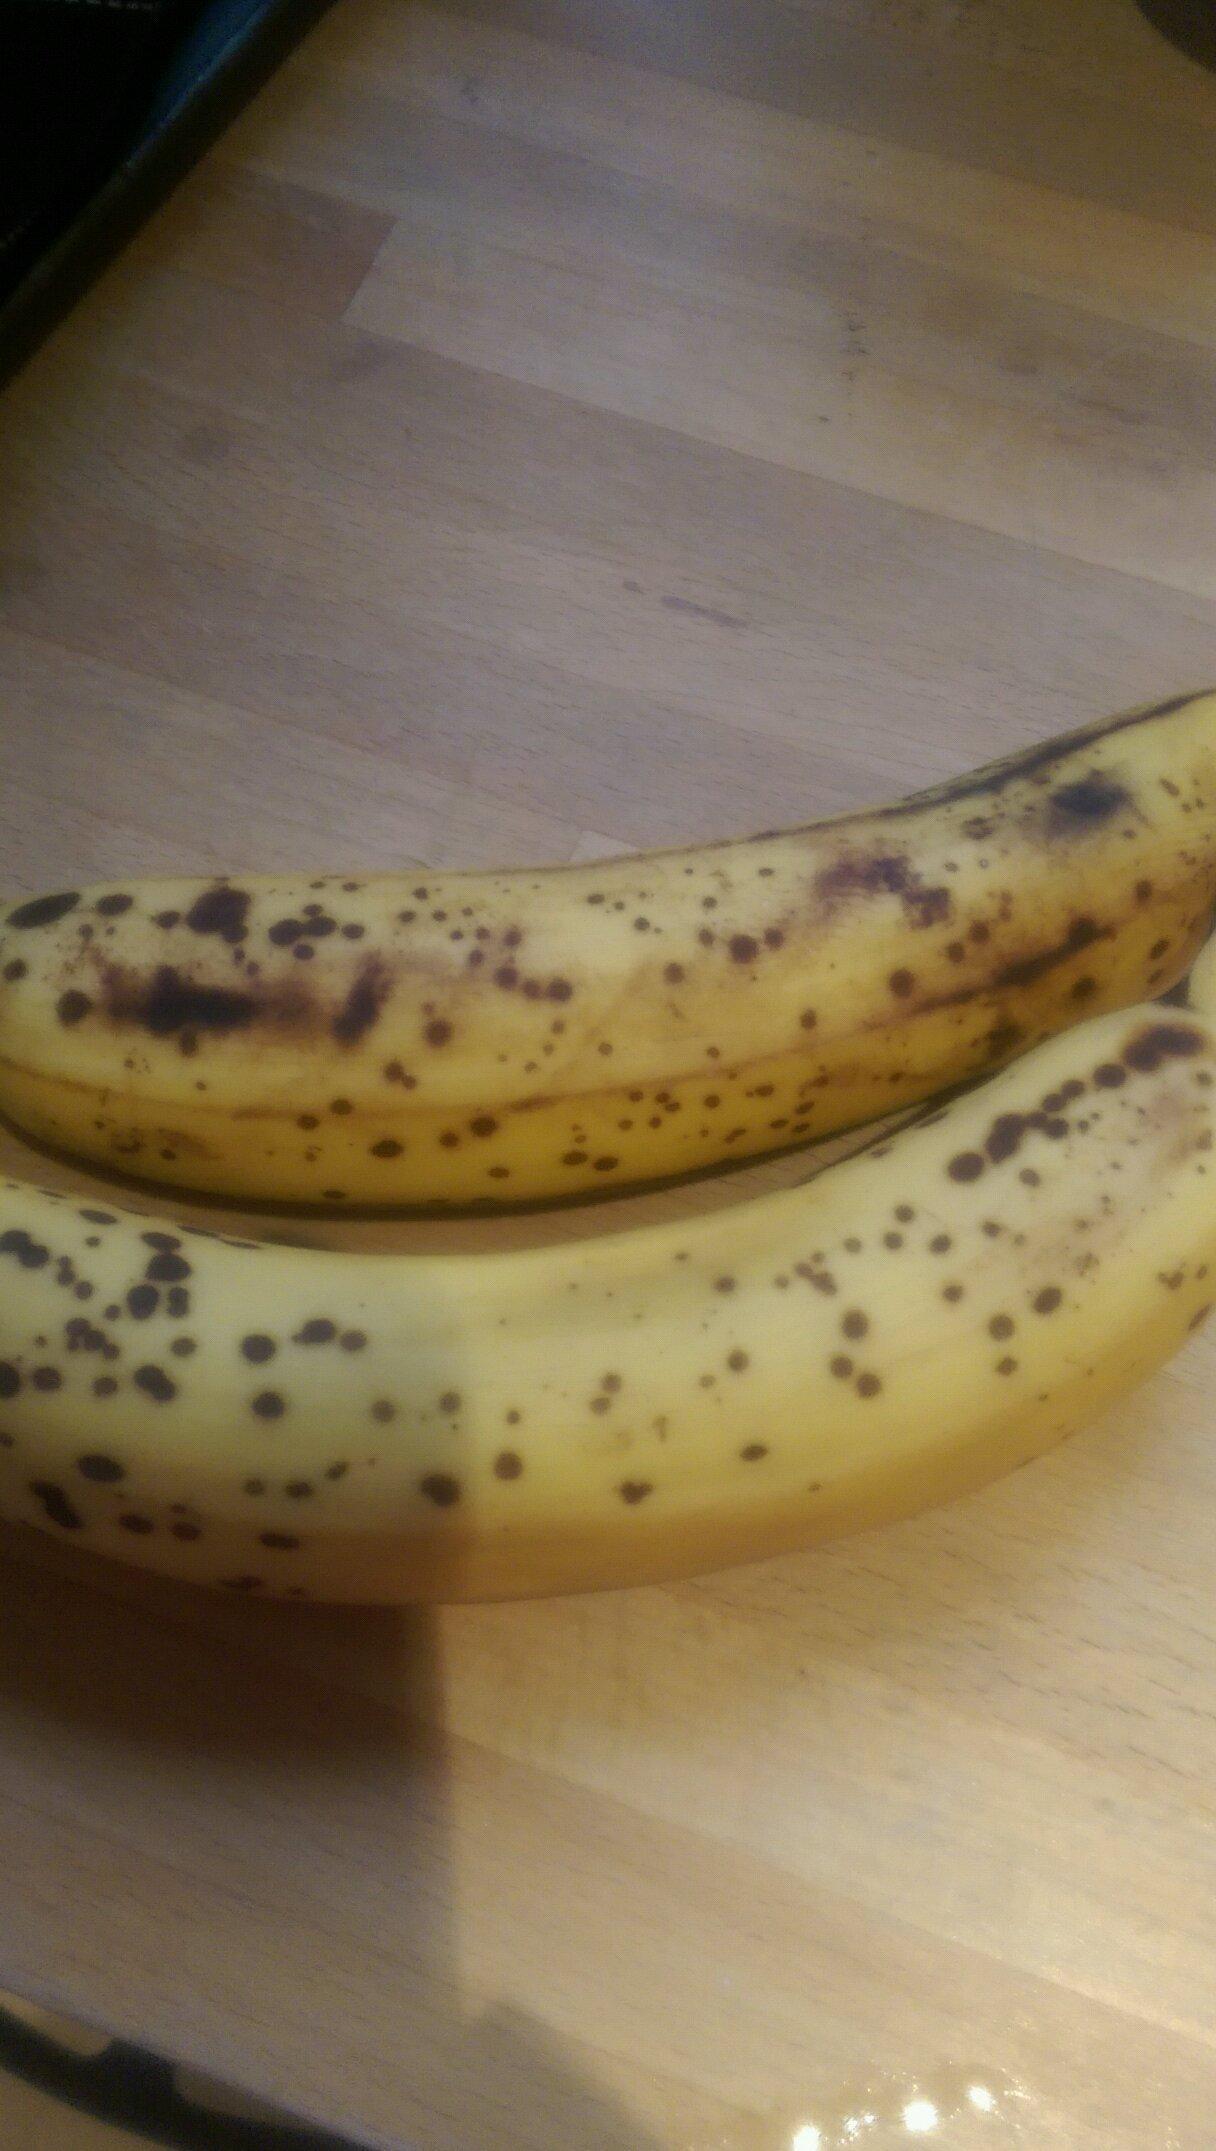 Squidgy bananas